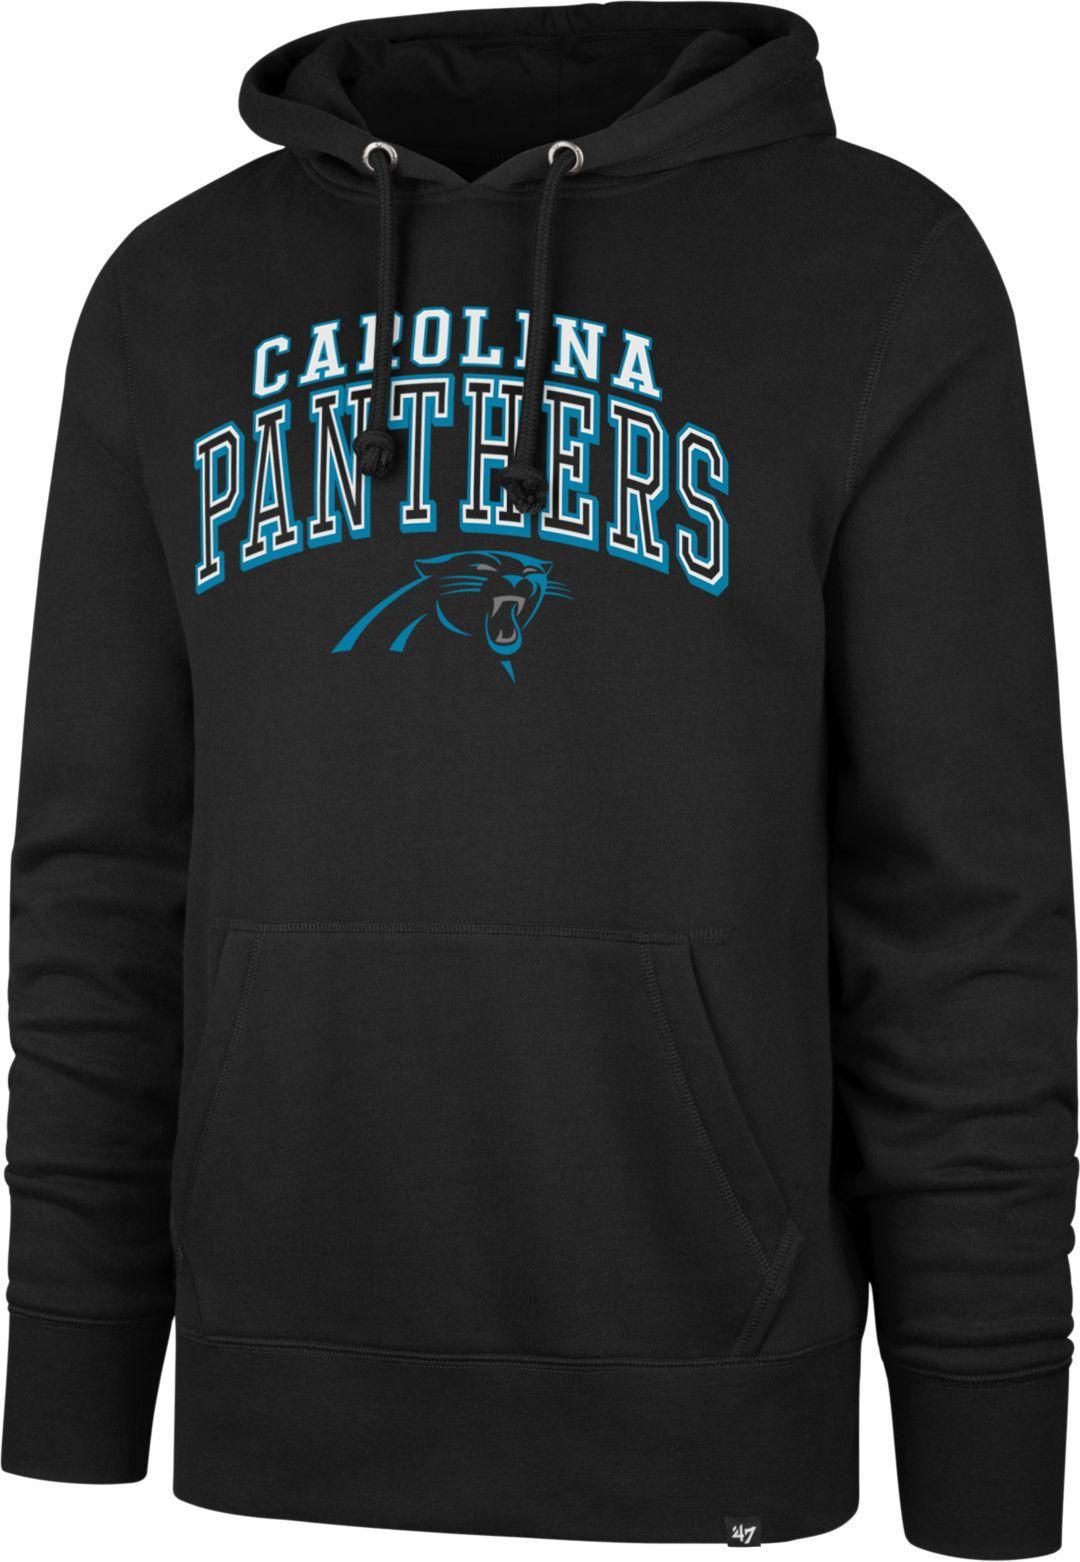 9e3412a2 '47 Men's Carolina Panthers Headline Black Hoodie